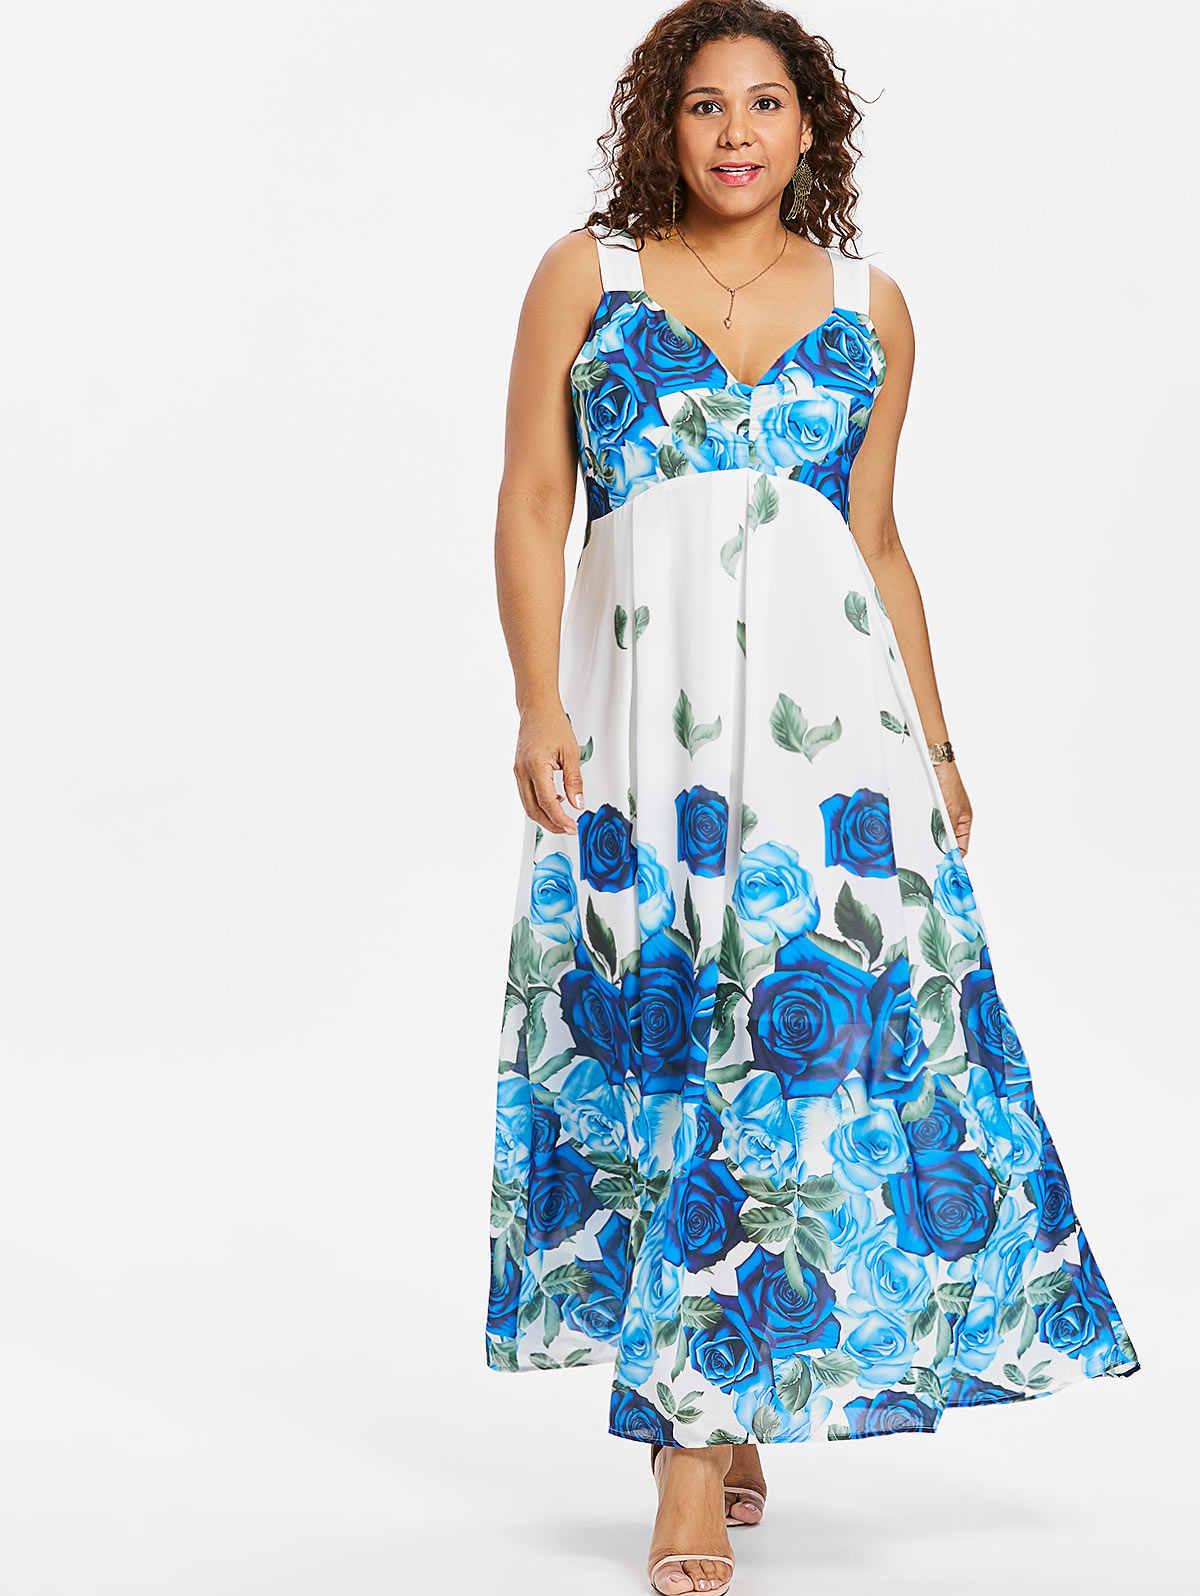 Wipalo Women Summer Bohemian Long Maxi Dresses Bodycon Sleeveless Floral  Print Boho Beach Floor Length Dress 65350abb91d0